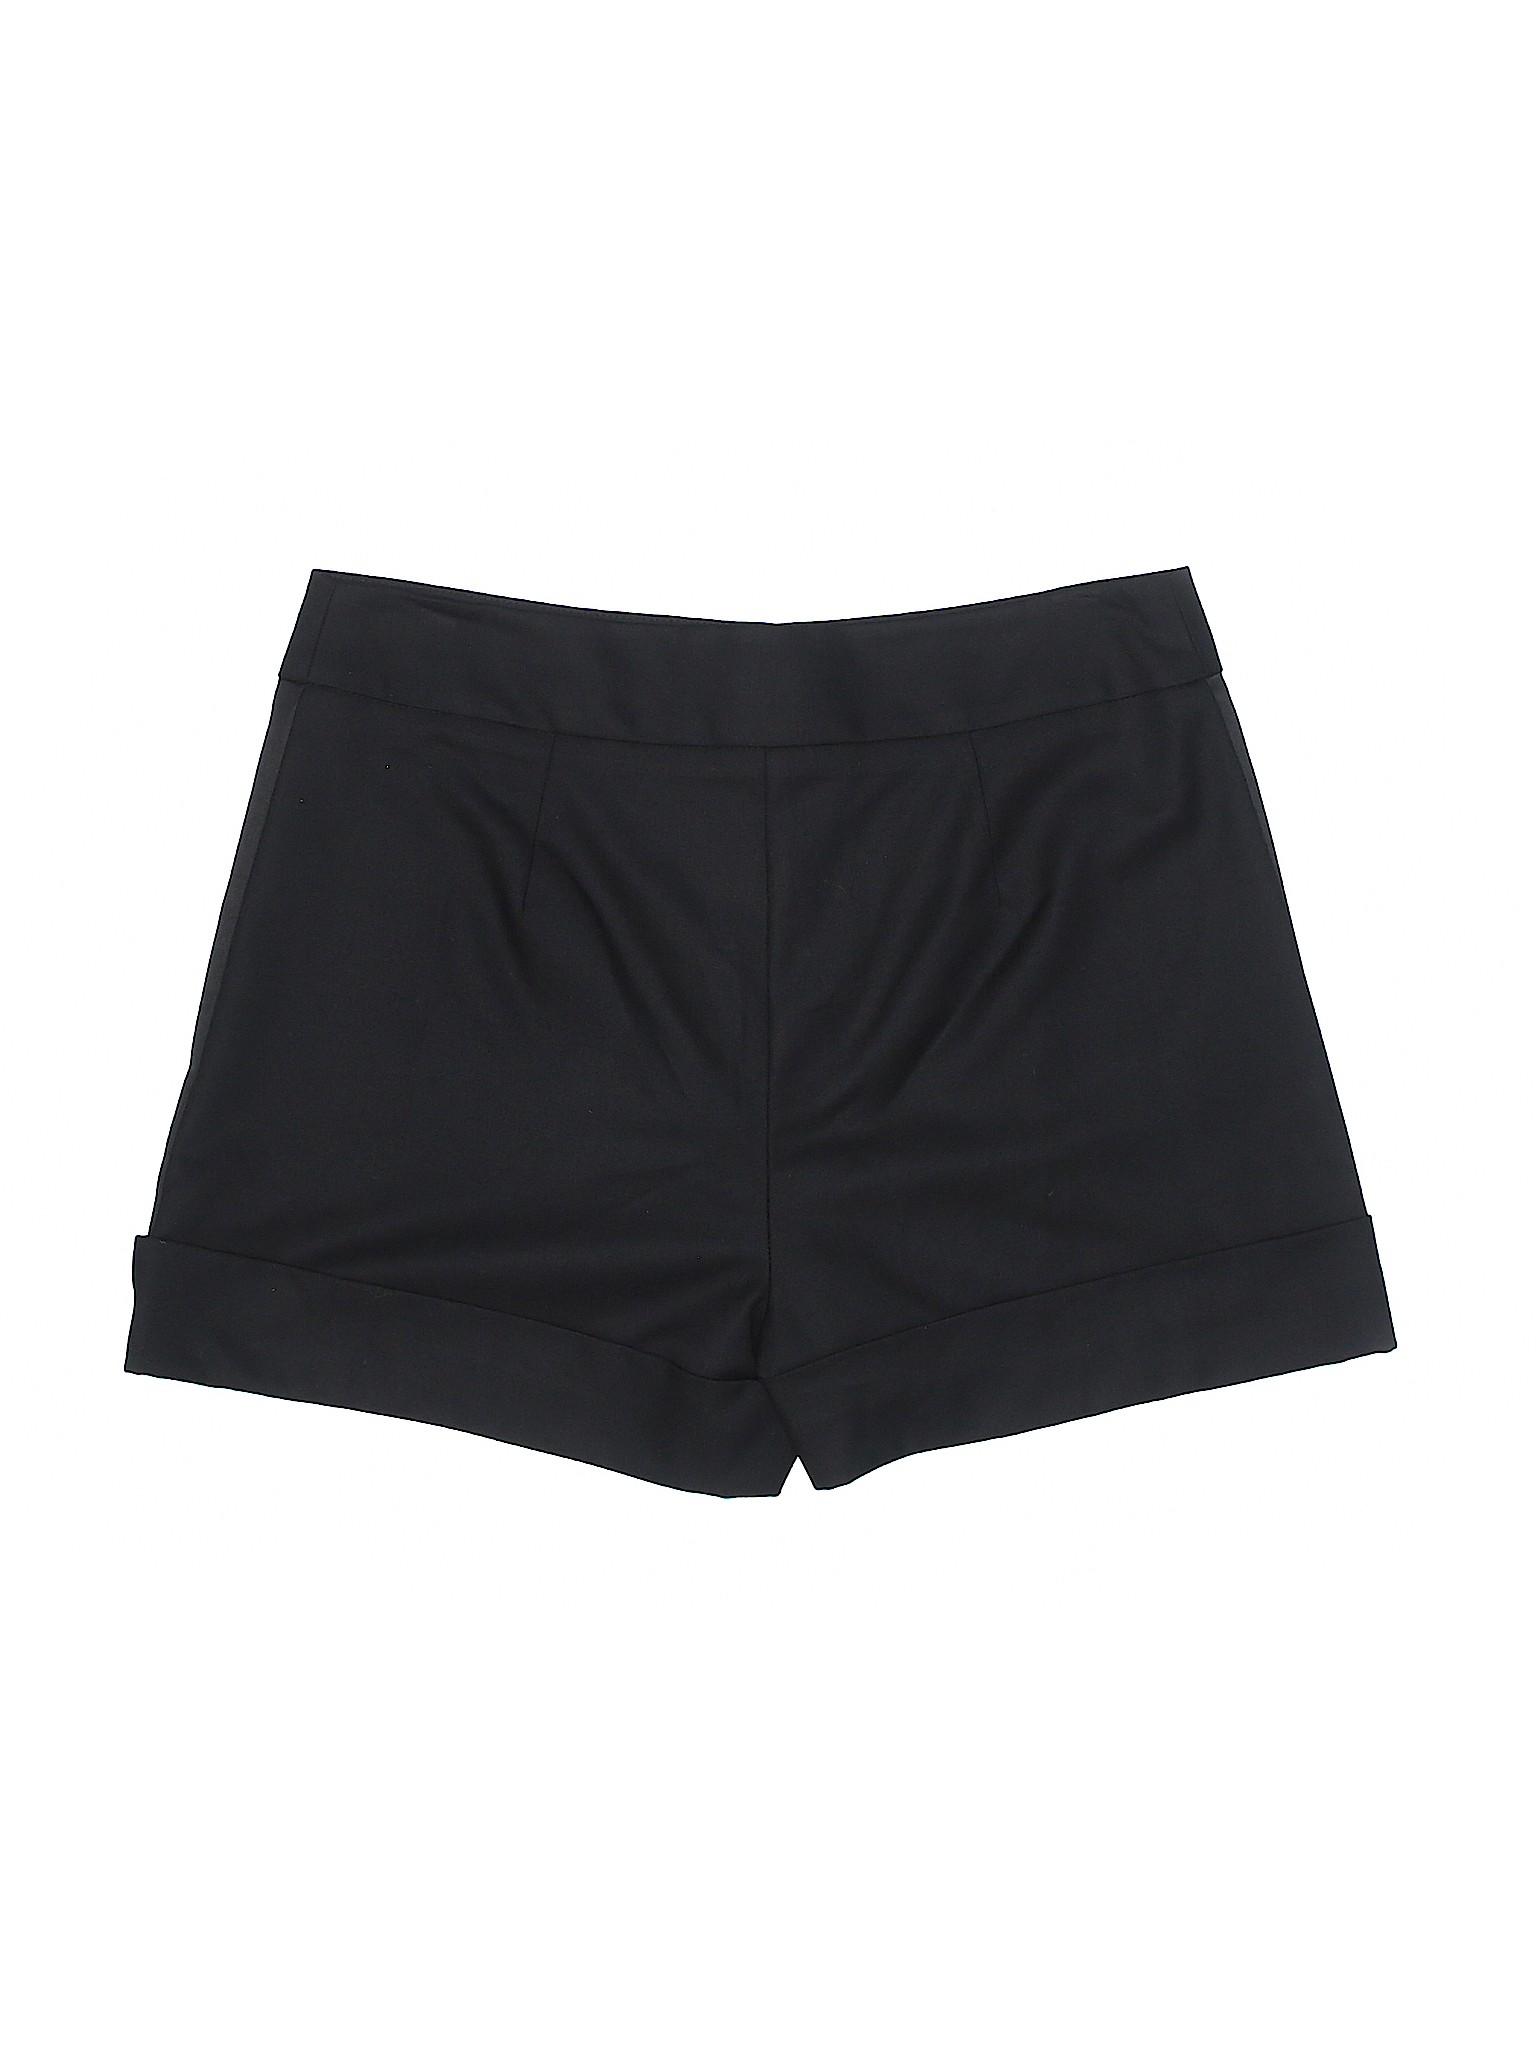 Turk Boutique Shorts Trina Trina Boutique Trina Shorts Boutique Dressy Turk Dressy qwPIXPr